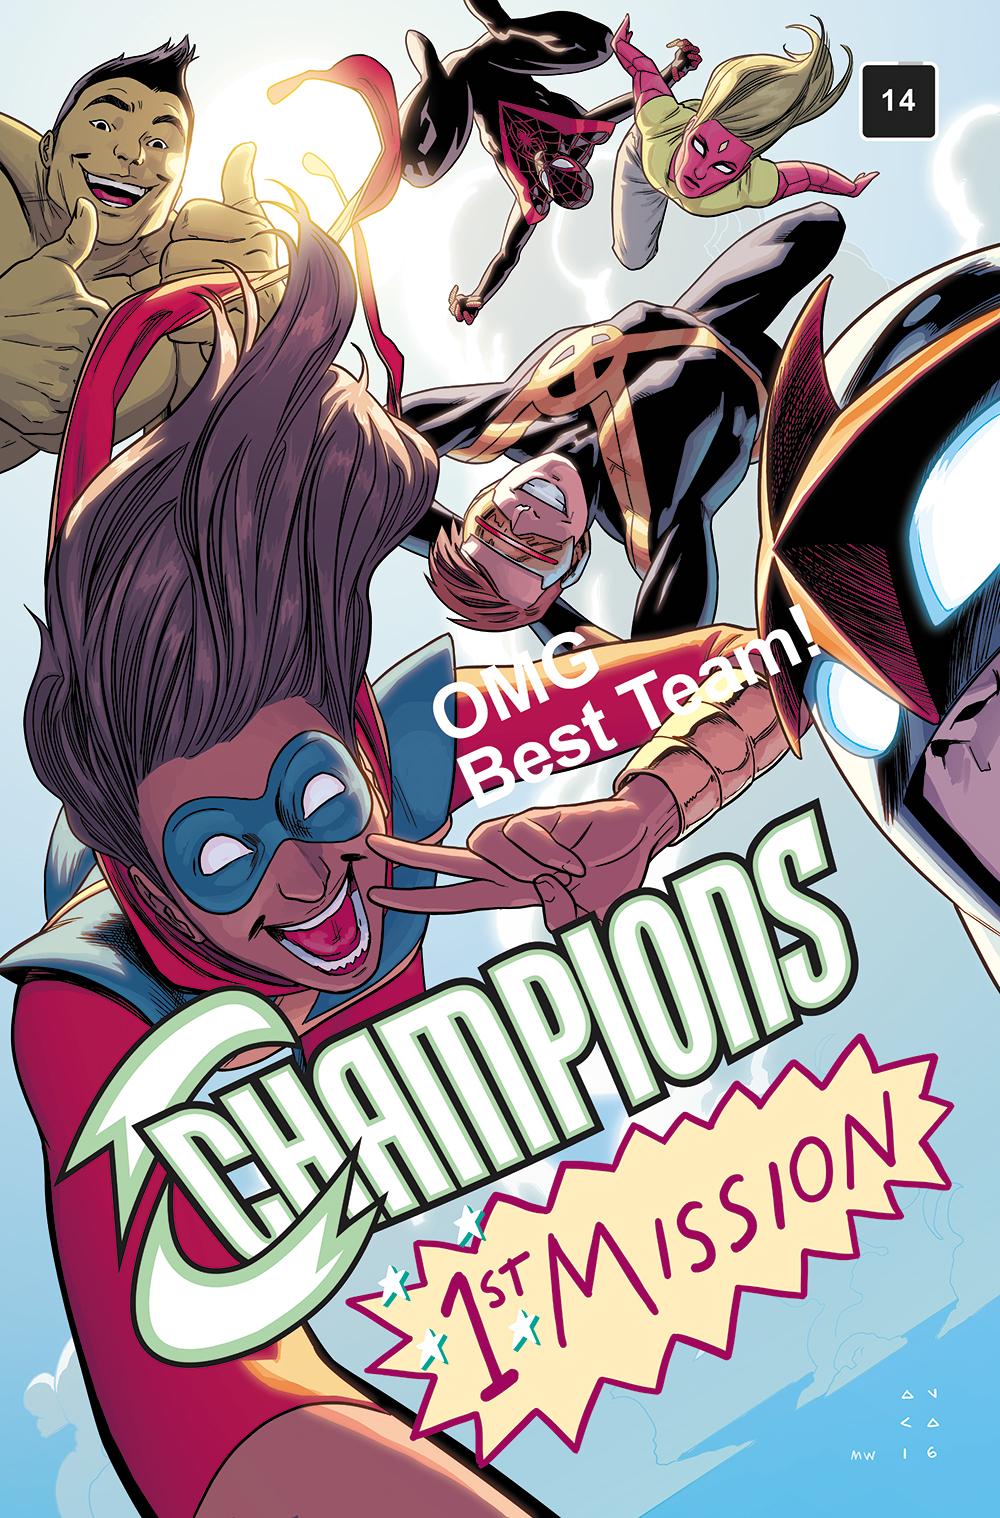 Champions Vol 2 1 Third Eye Comics Exclusive Variant Textless.jpg